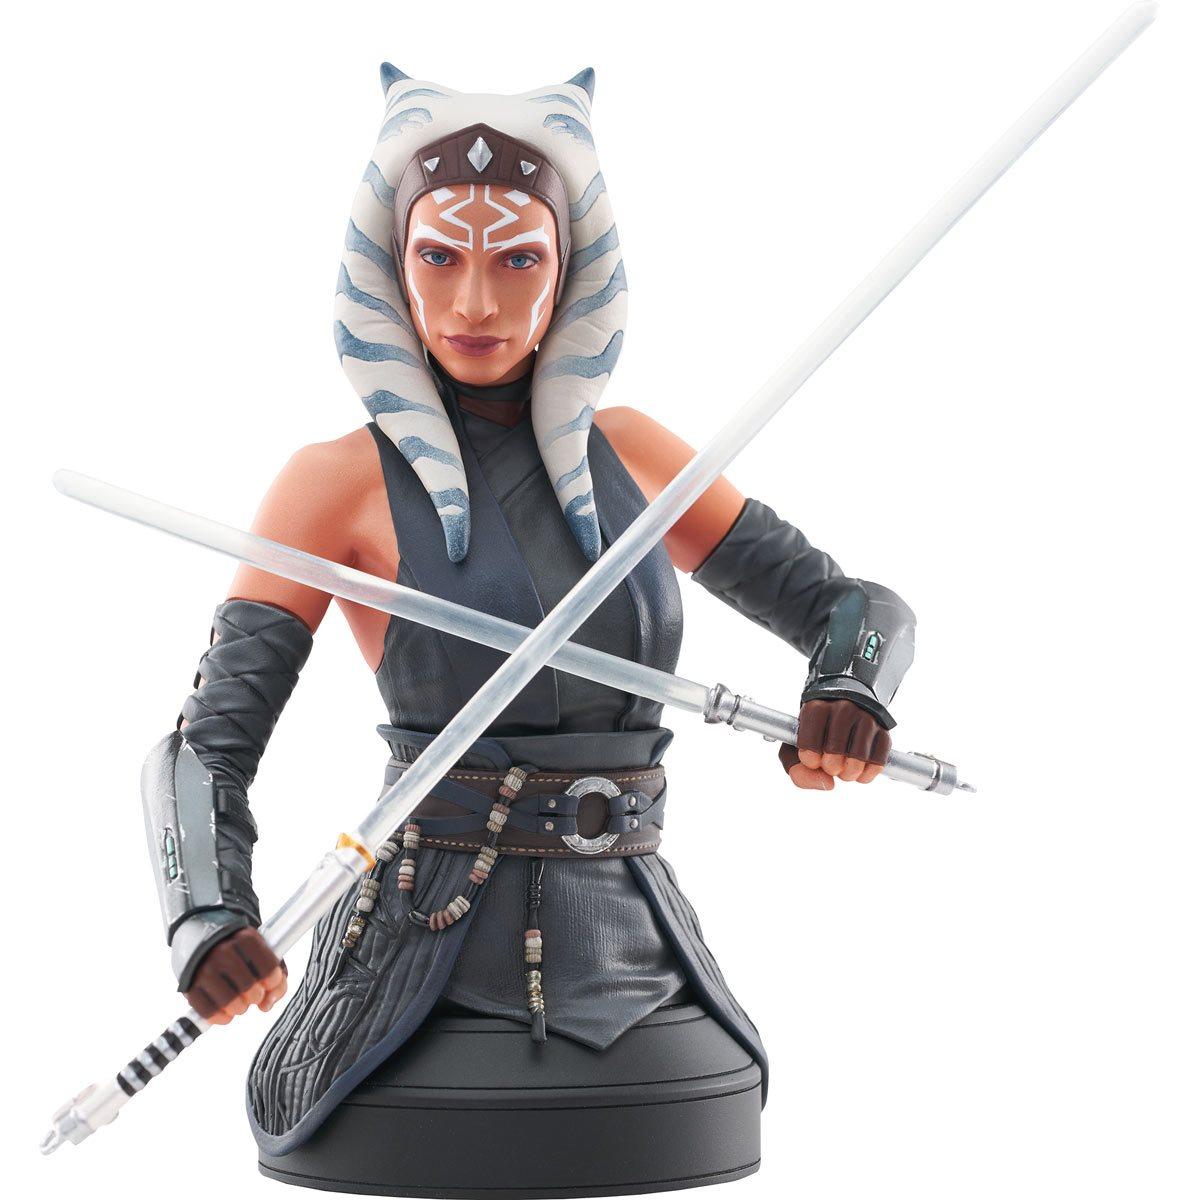 Star Wars The Mandalorian Ahsoka Tano 1:6 Scale Mini-Bust画像